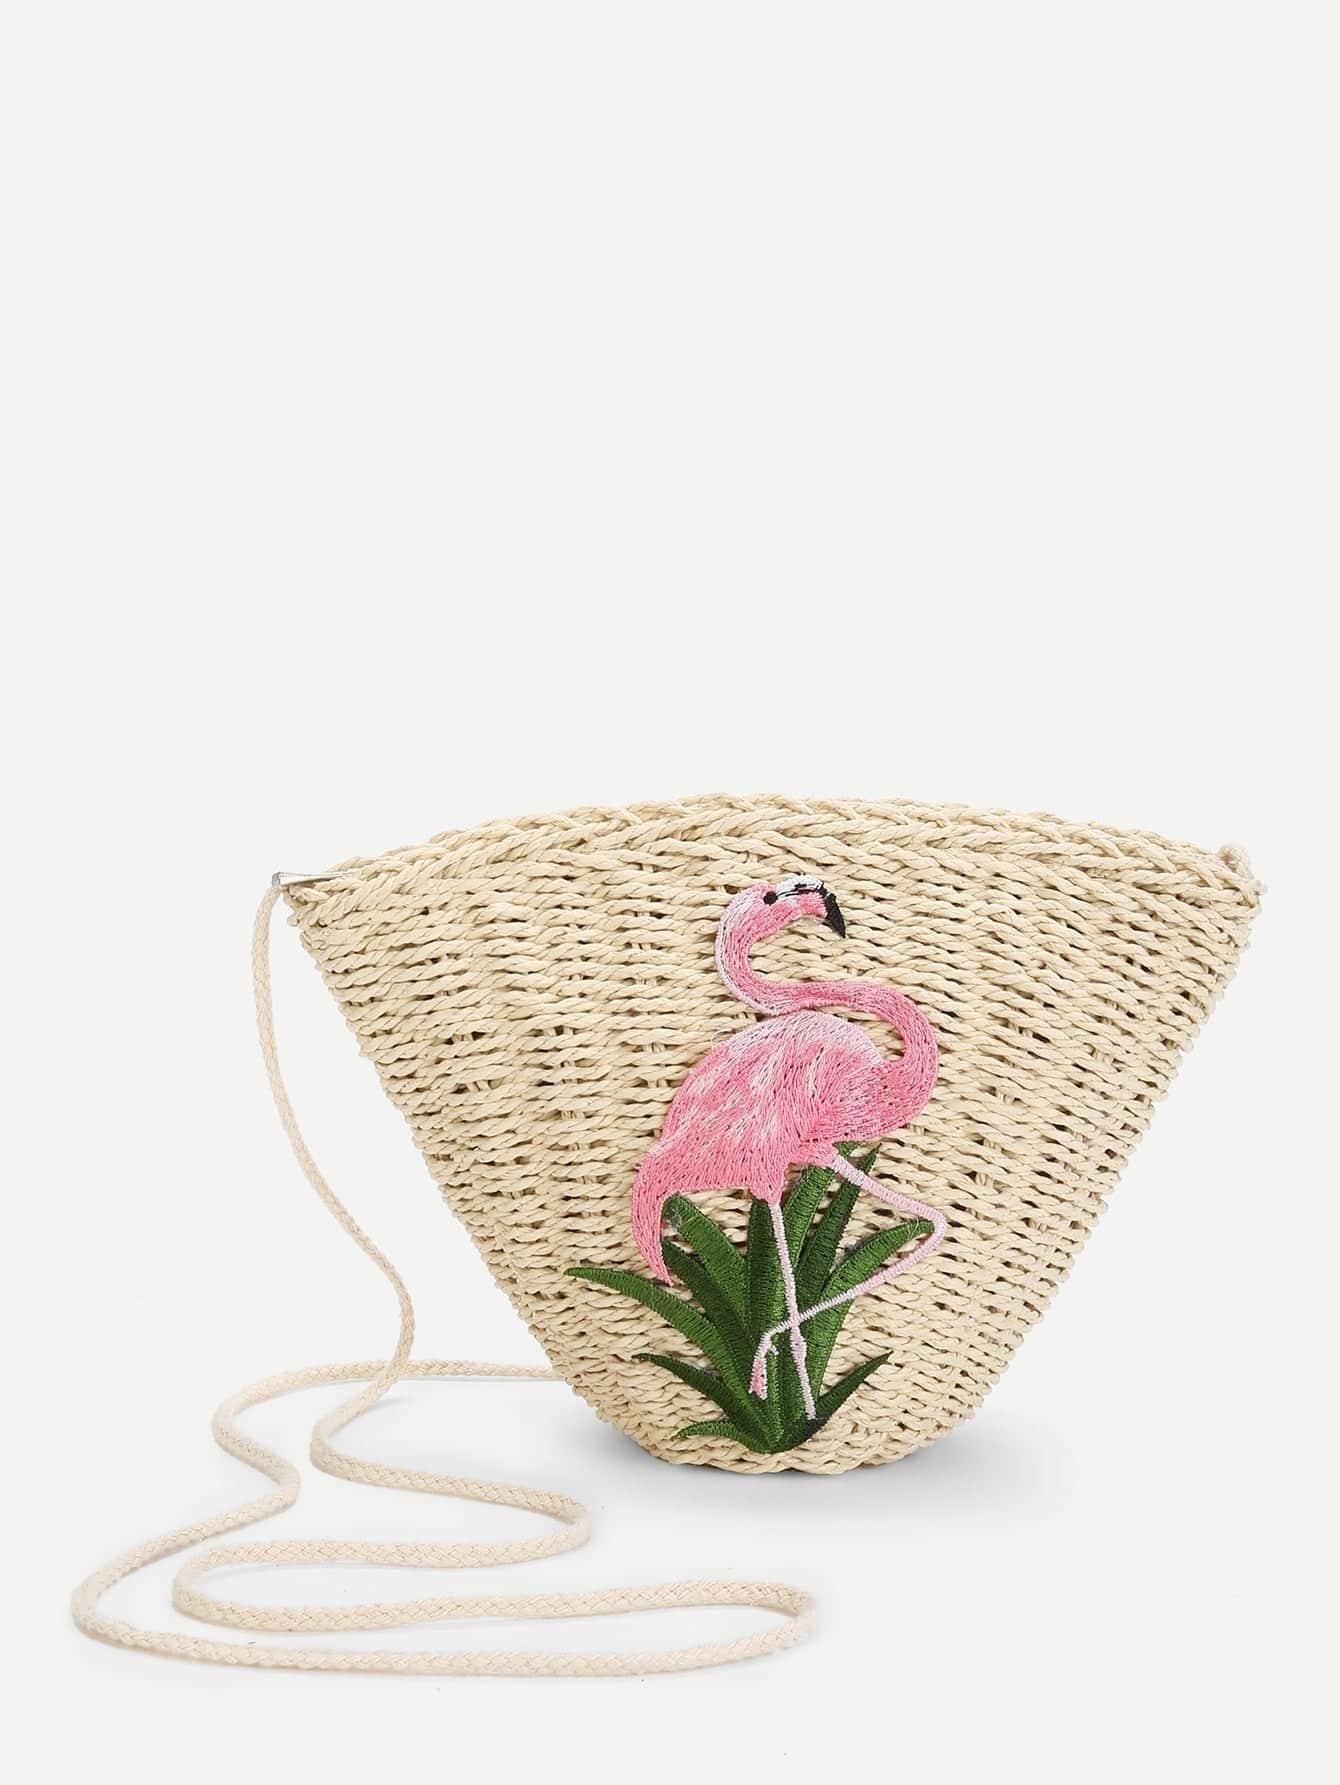 Flamingo Pattern Straw Tote Bag straw flamingo embroidered tote bag